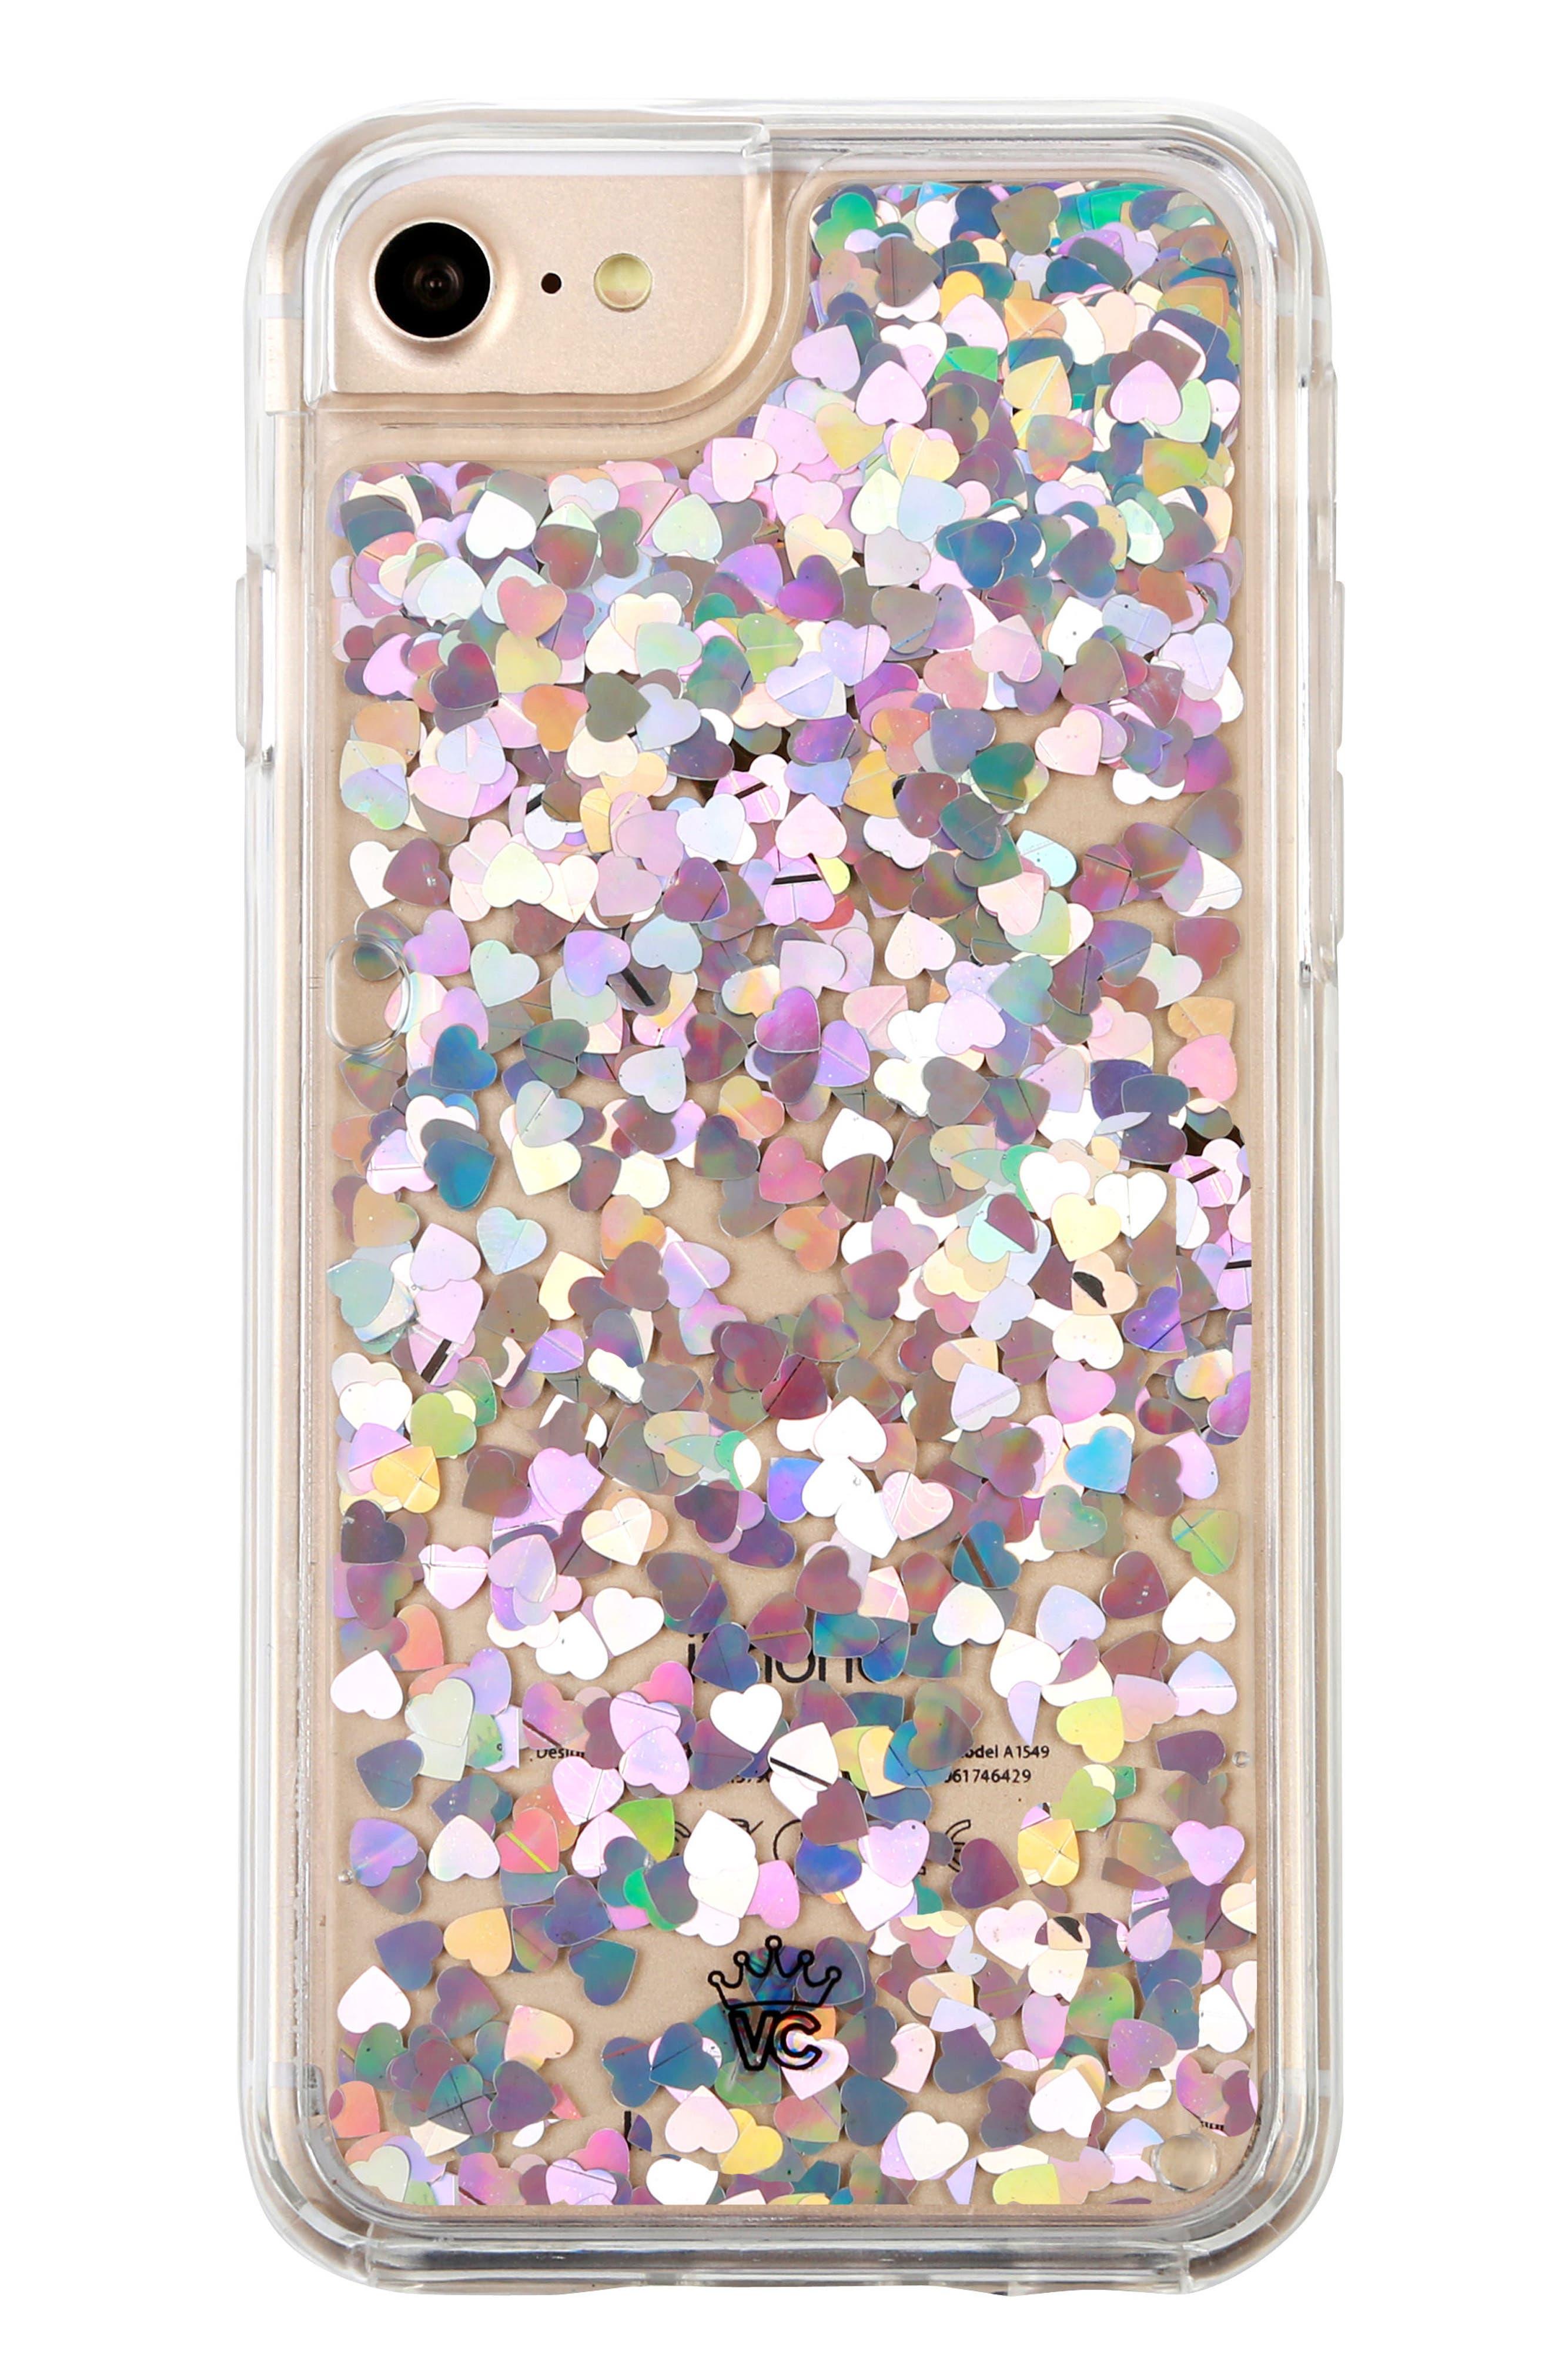 Holo Hearts iPhone 7 Case, Main, color, 040